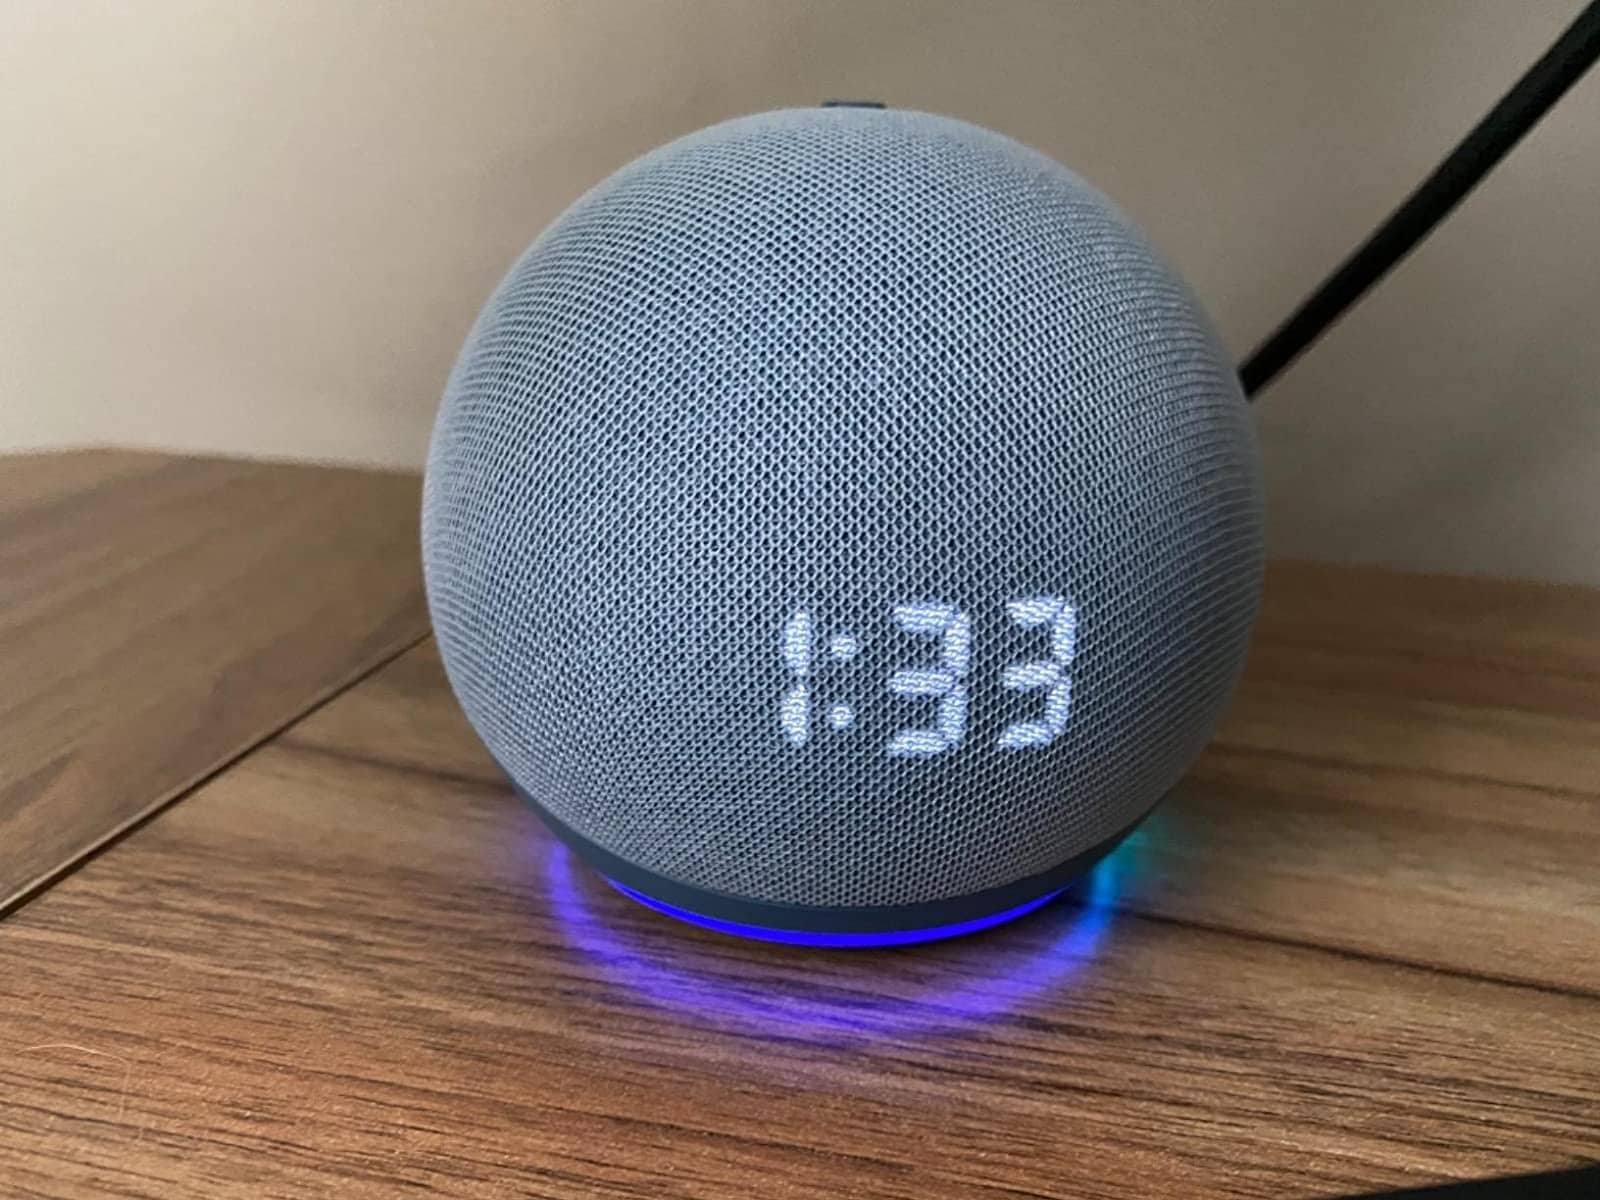 Loa thông minh Amazon Echo Dot 4 with Clock